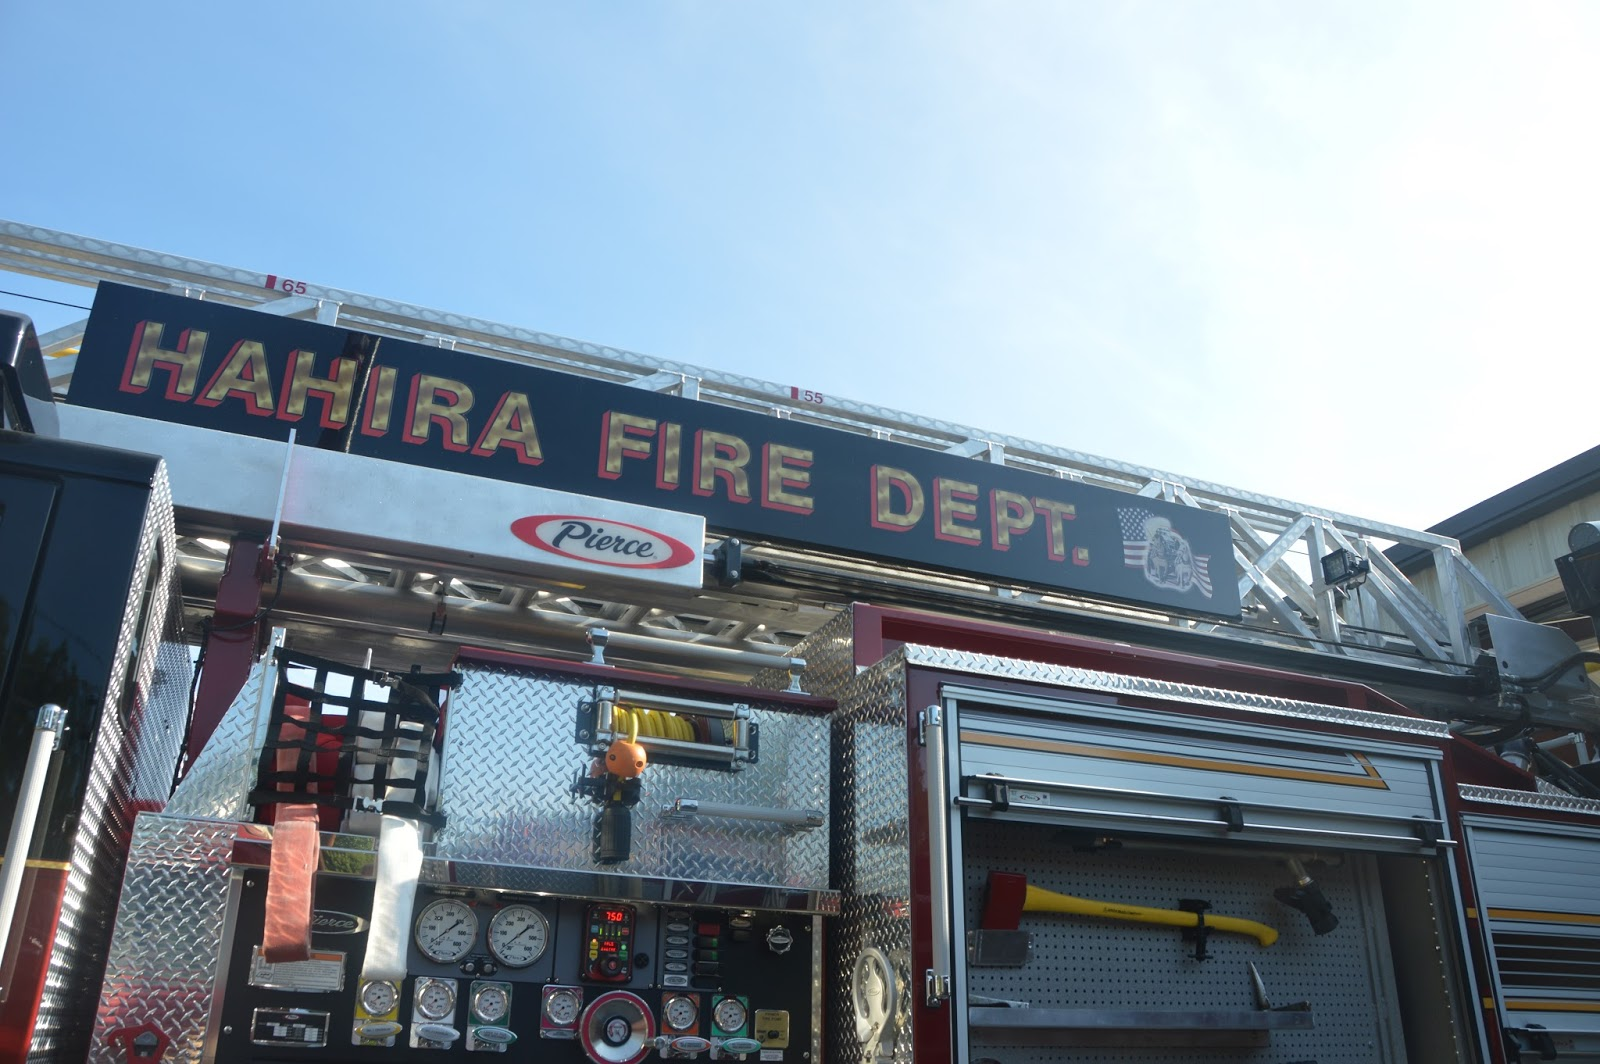 Fire Station Visit 2016